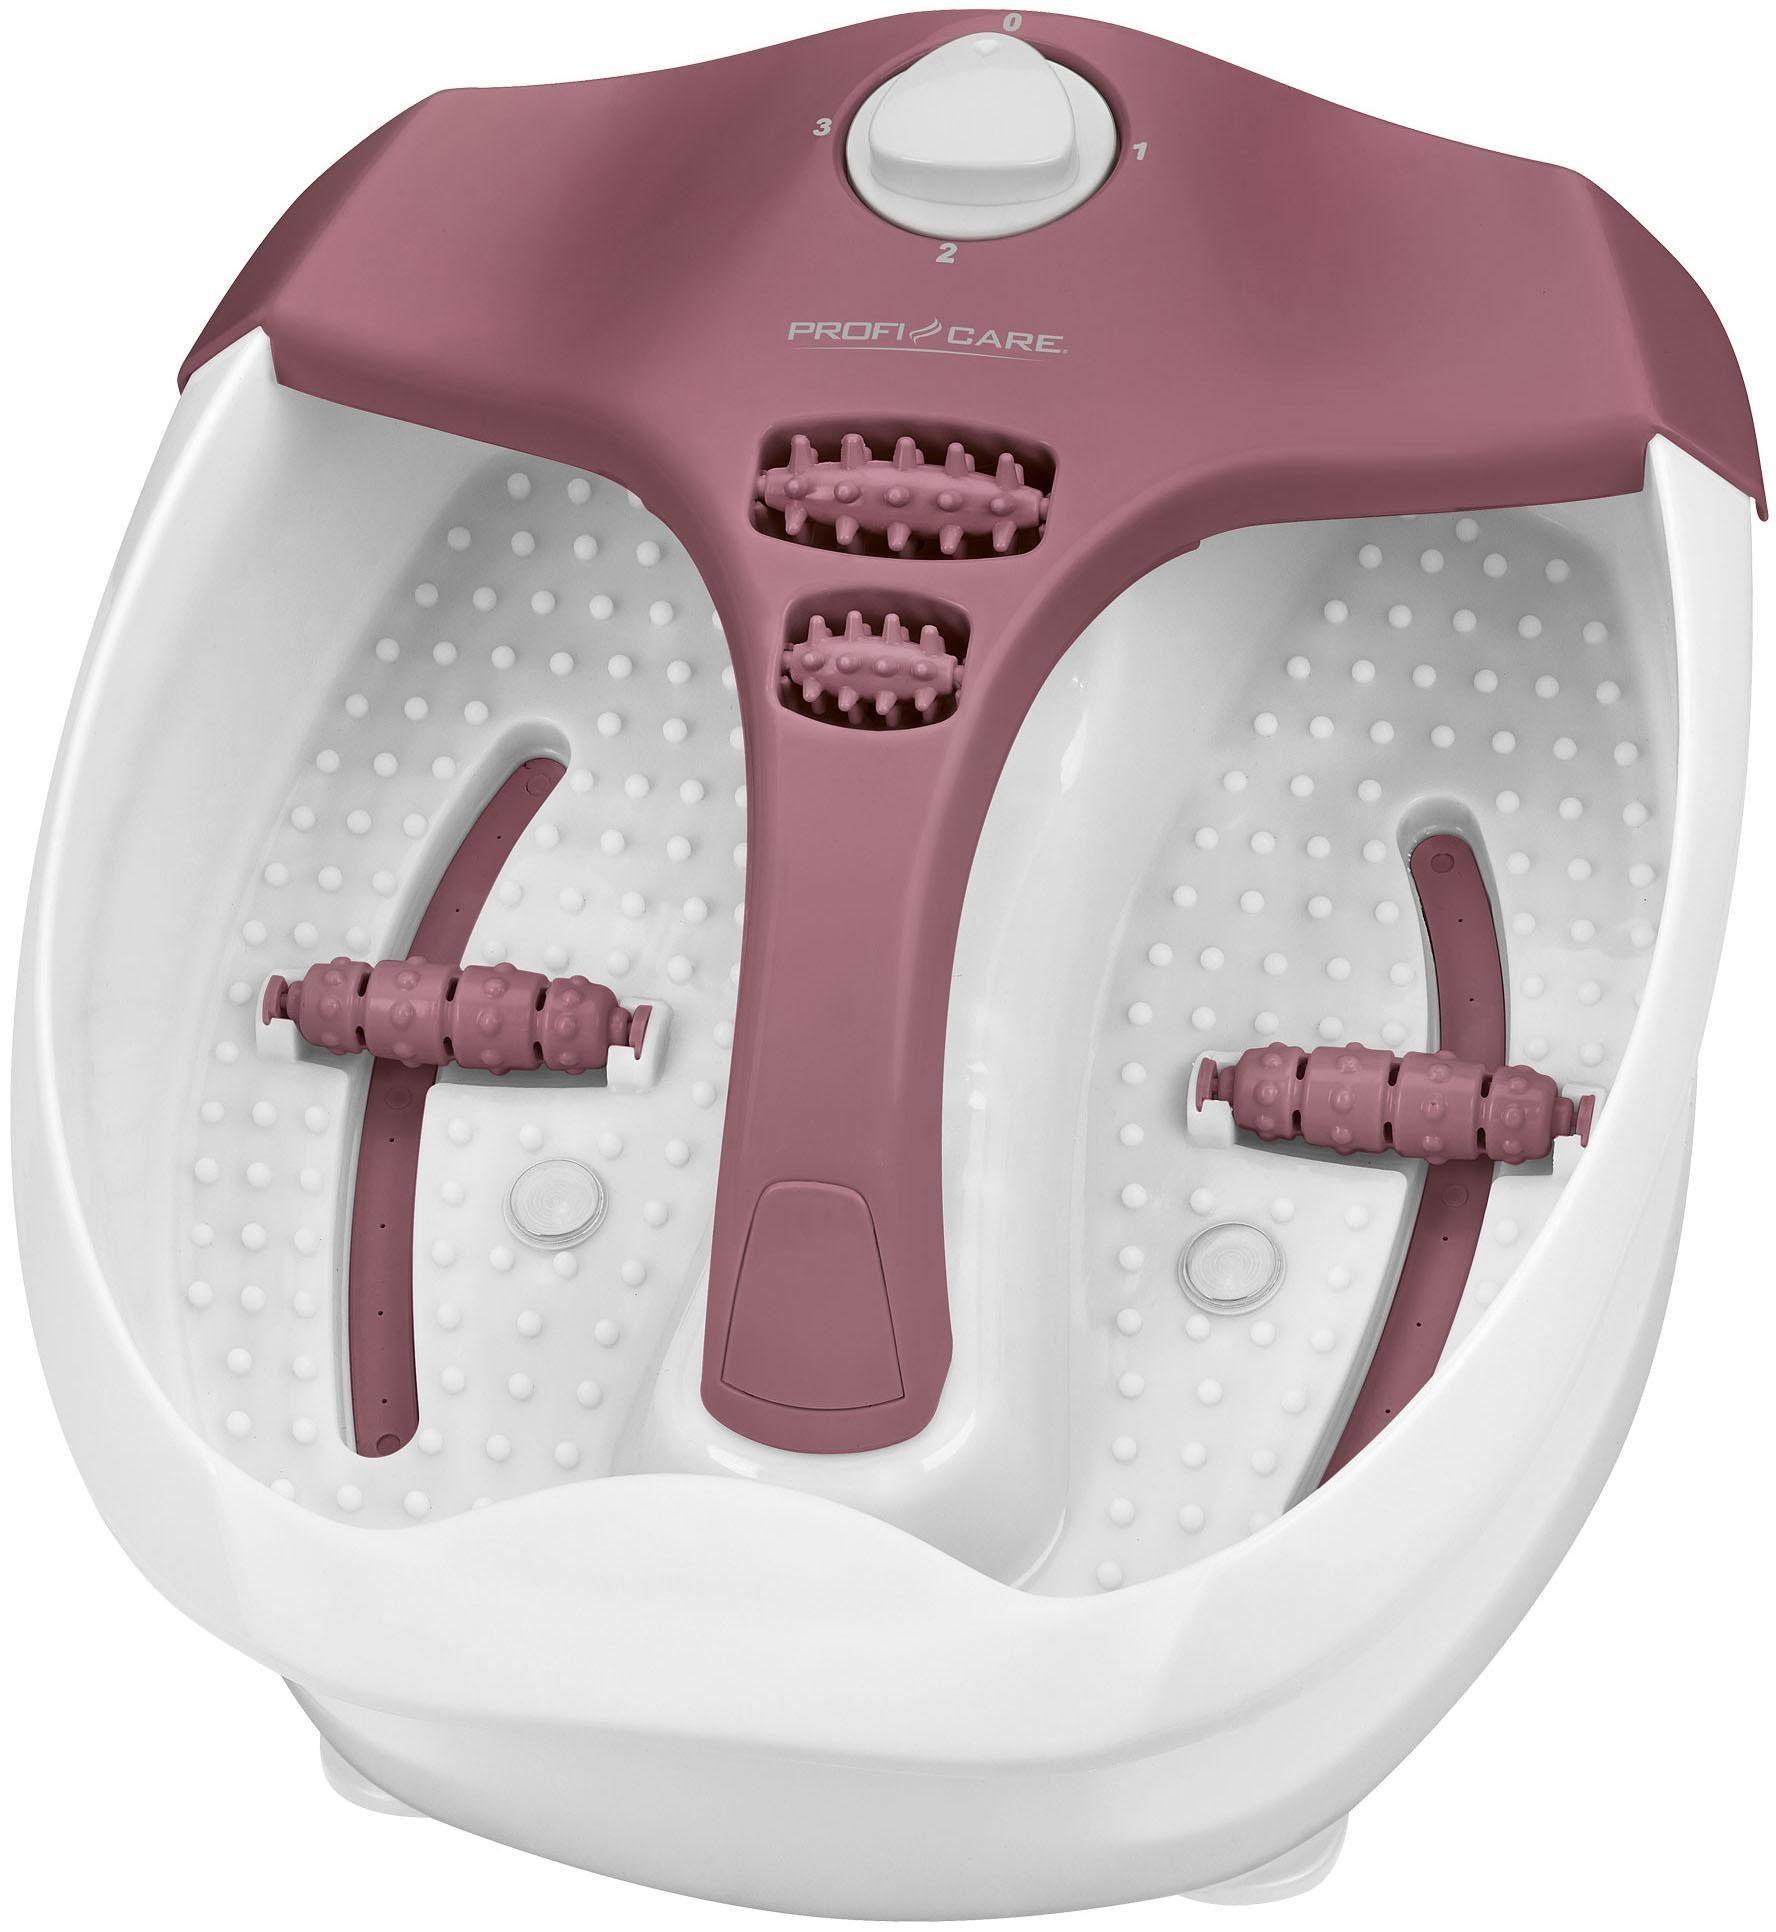 ProfiCare Fußmassagegerät PC-FM 3027, Intensiver Whirlpool-Effekt